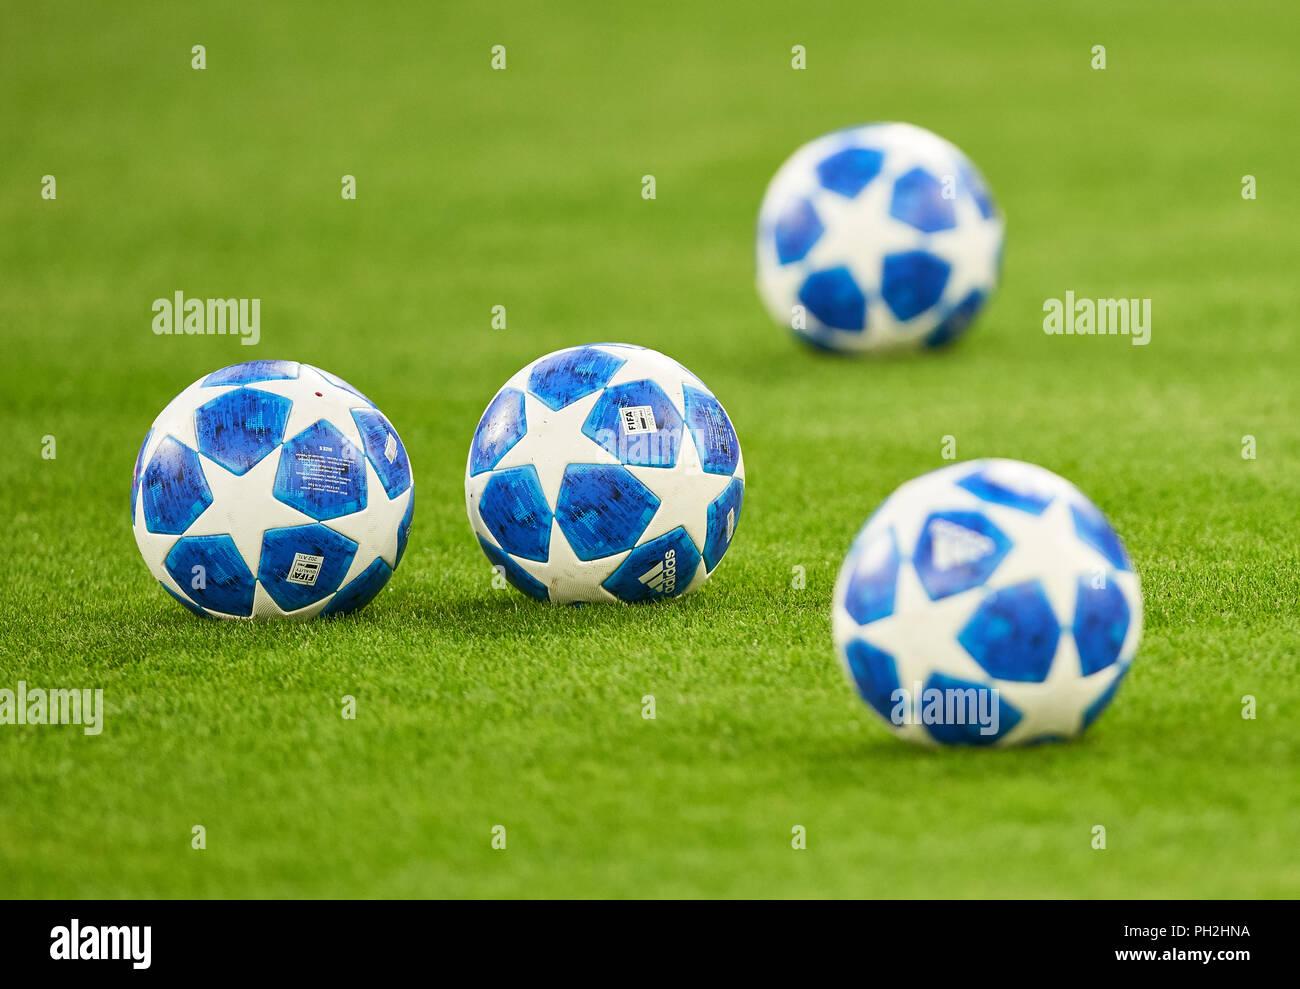 Champions League Ball Stock Photos   Champions League Ball Stock ... d345fb252783a